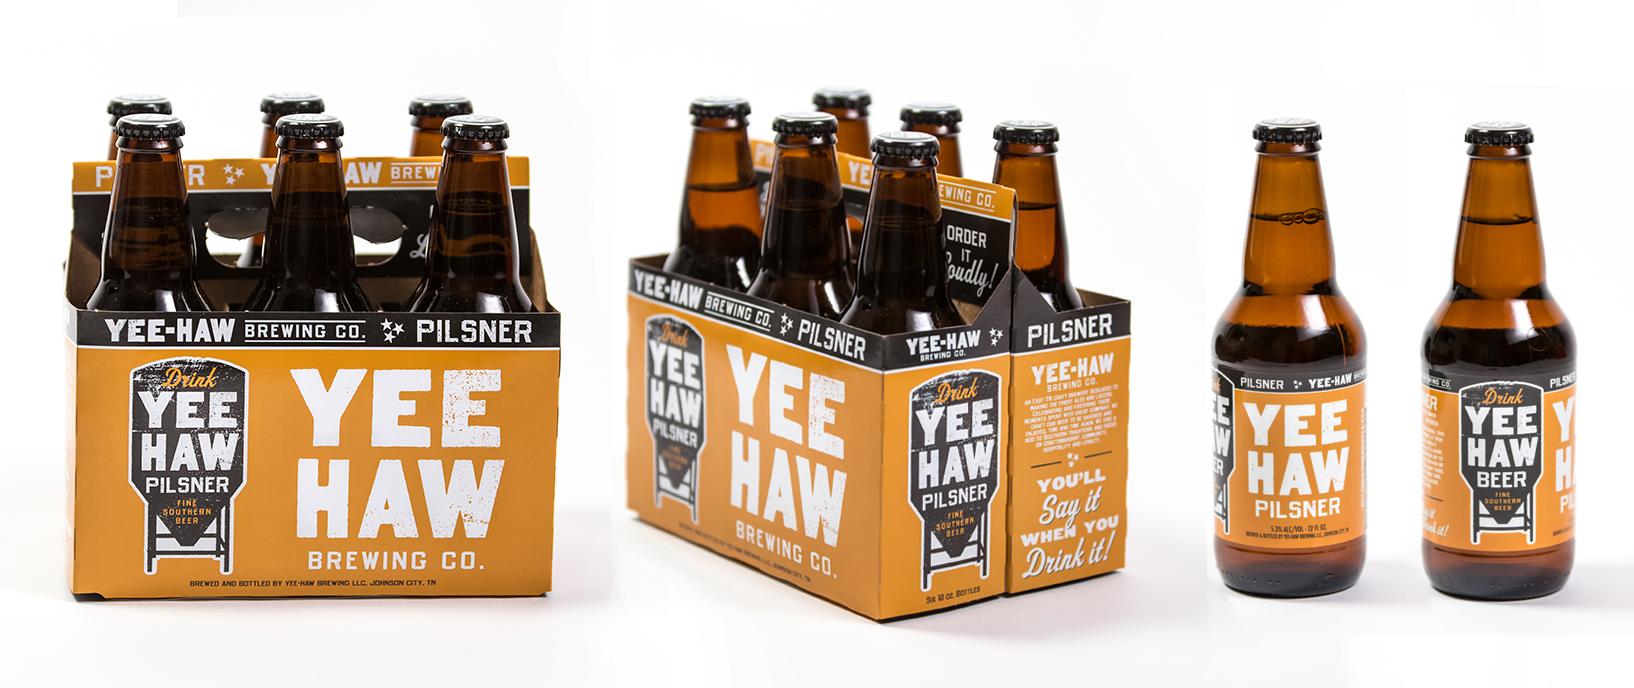 yee haw brewing announcing - 1634×688